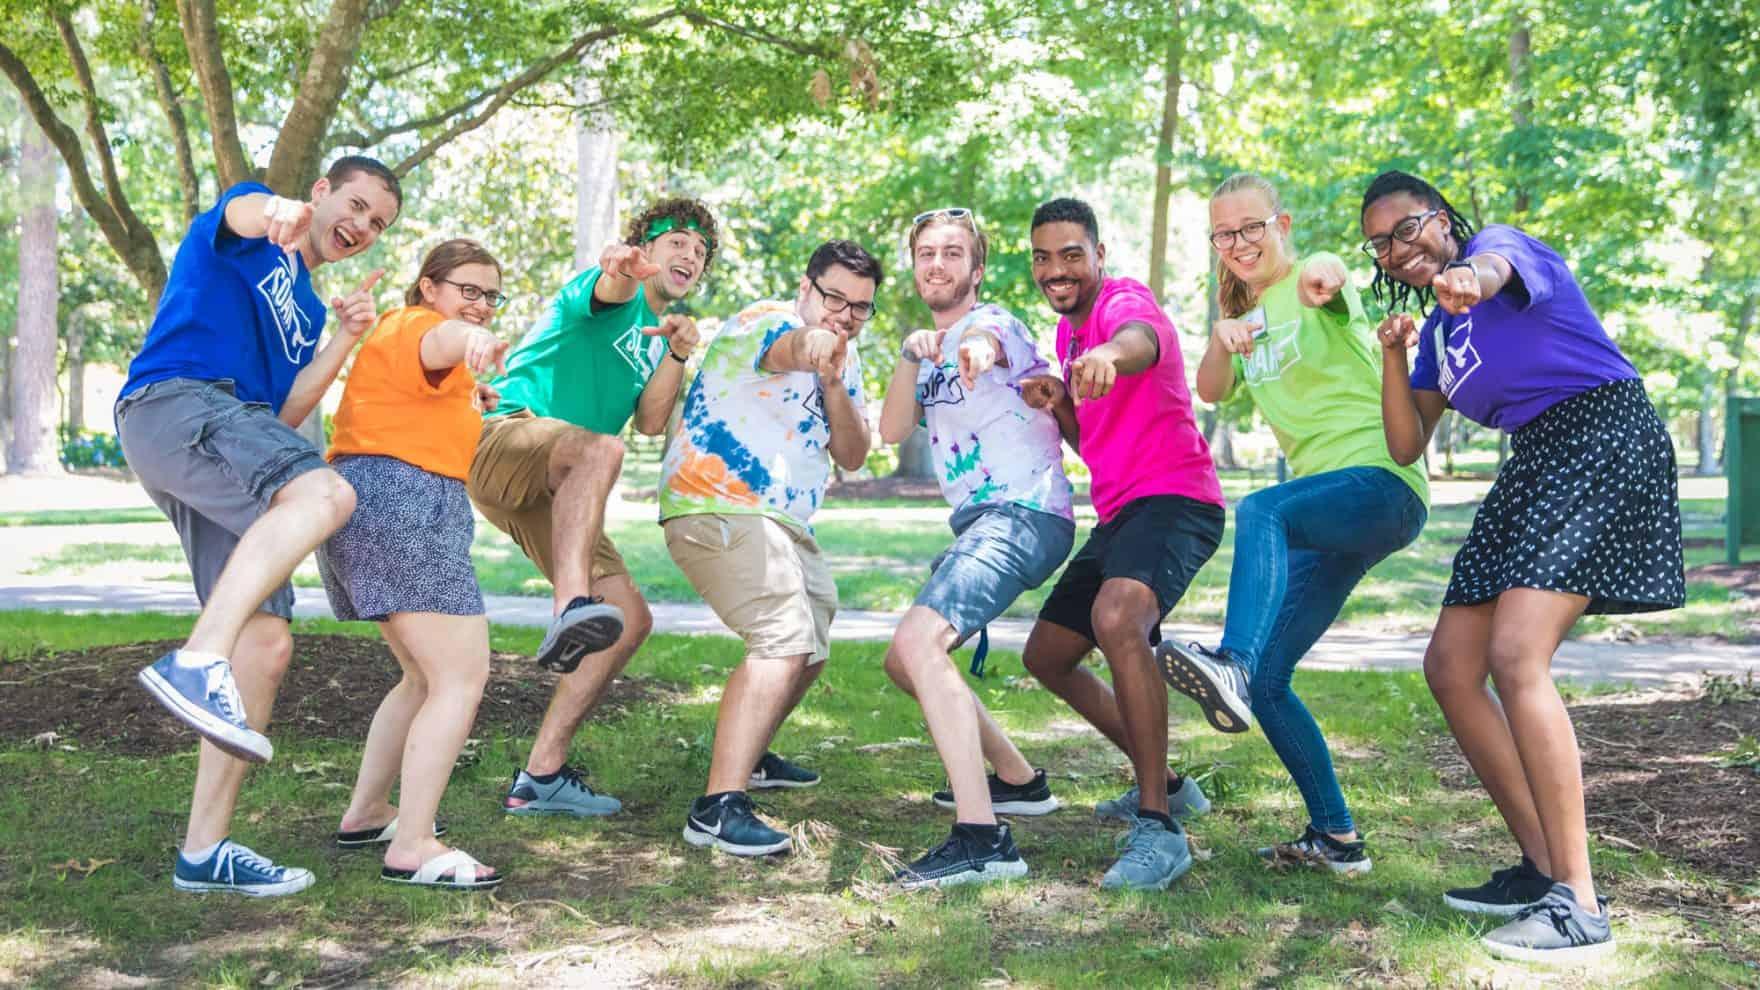 Students at Regent's college orientation for incoming freshmen in Virginia Beach, VA 23464.